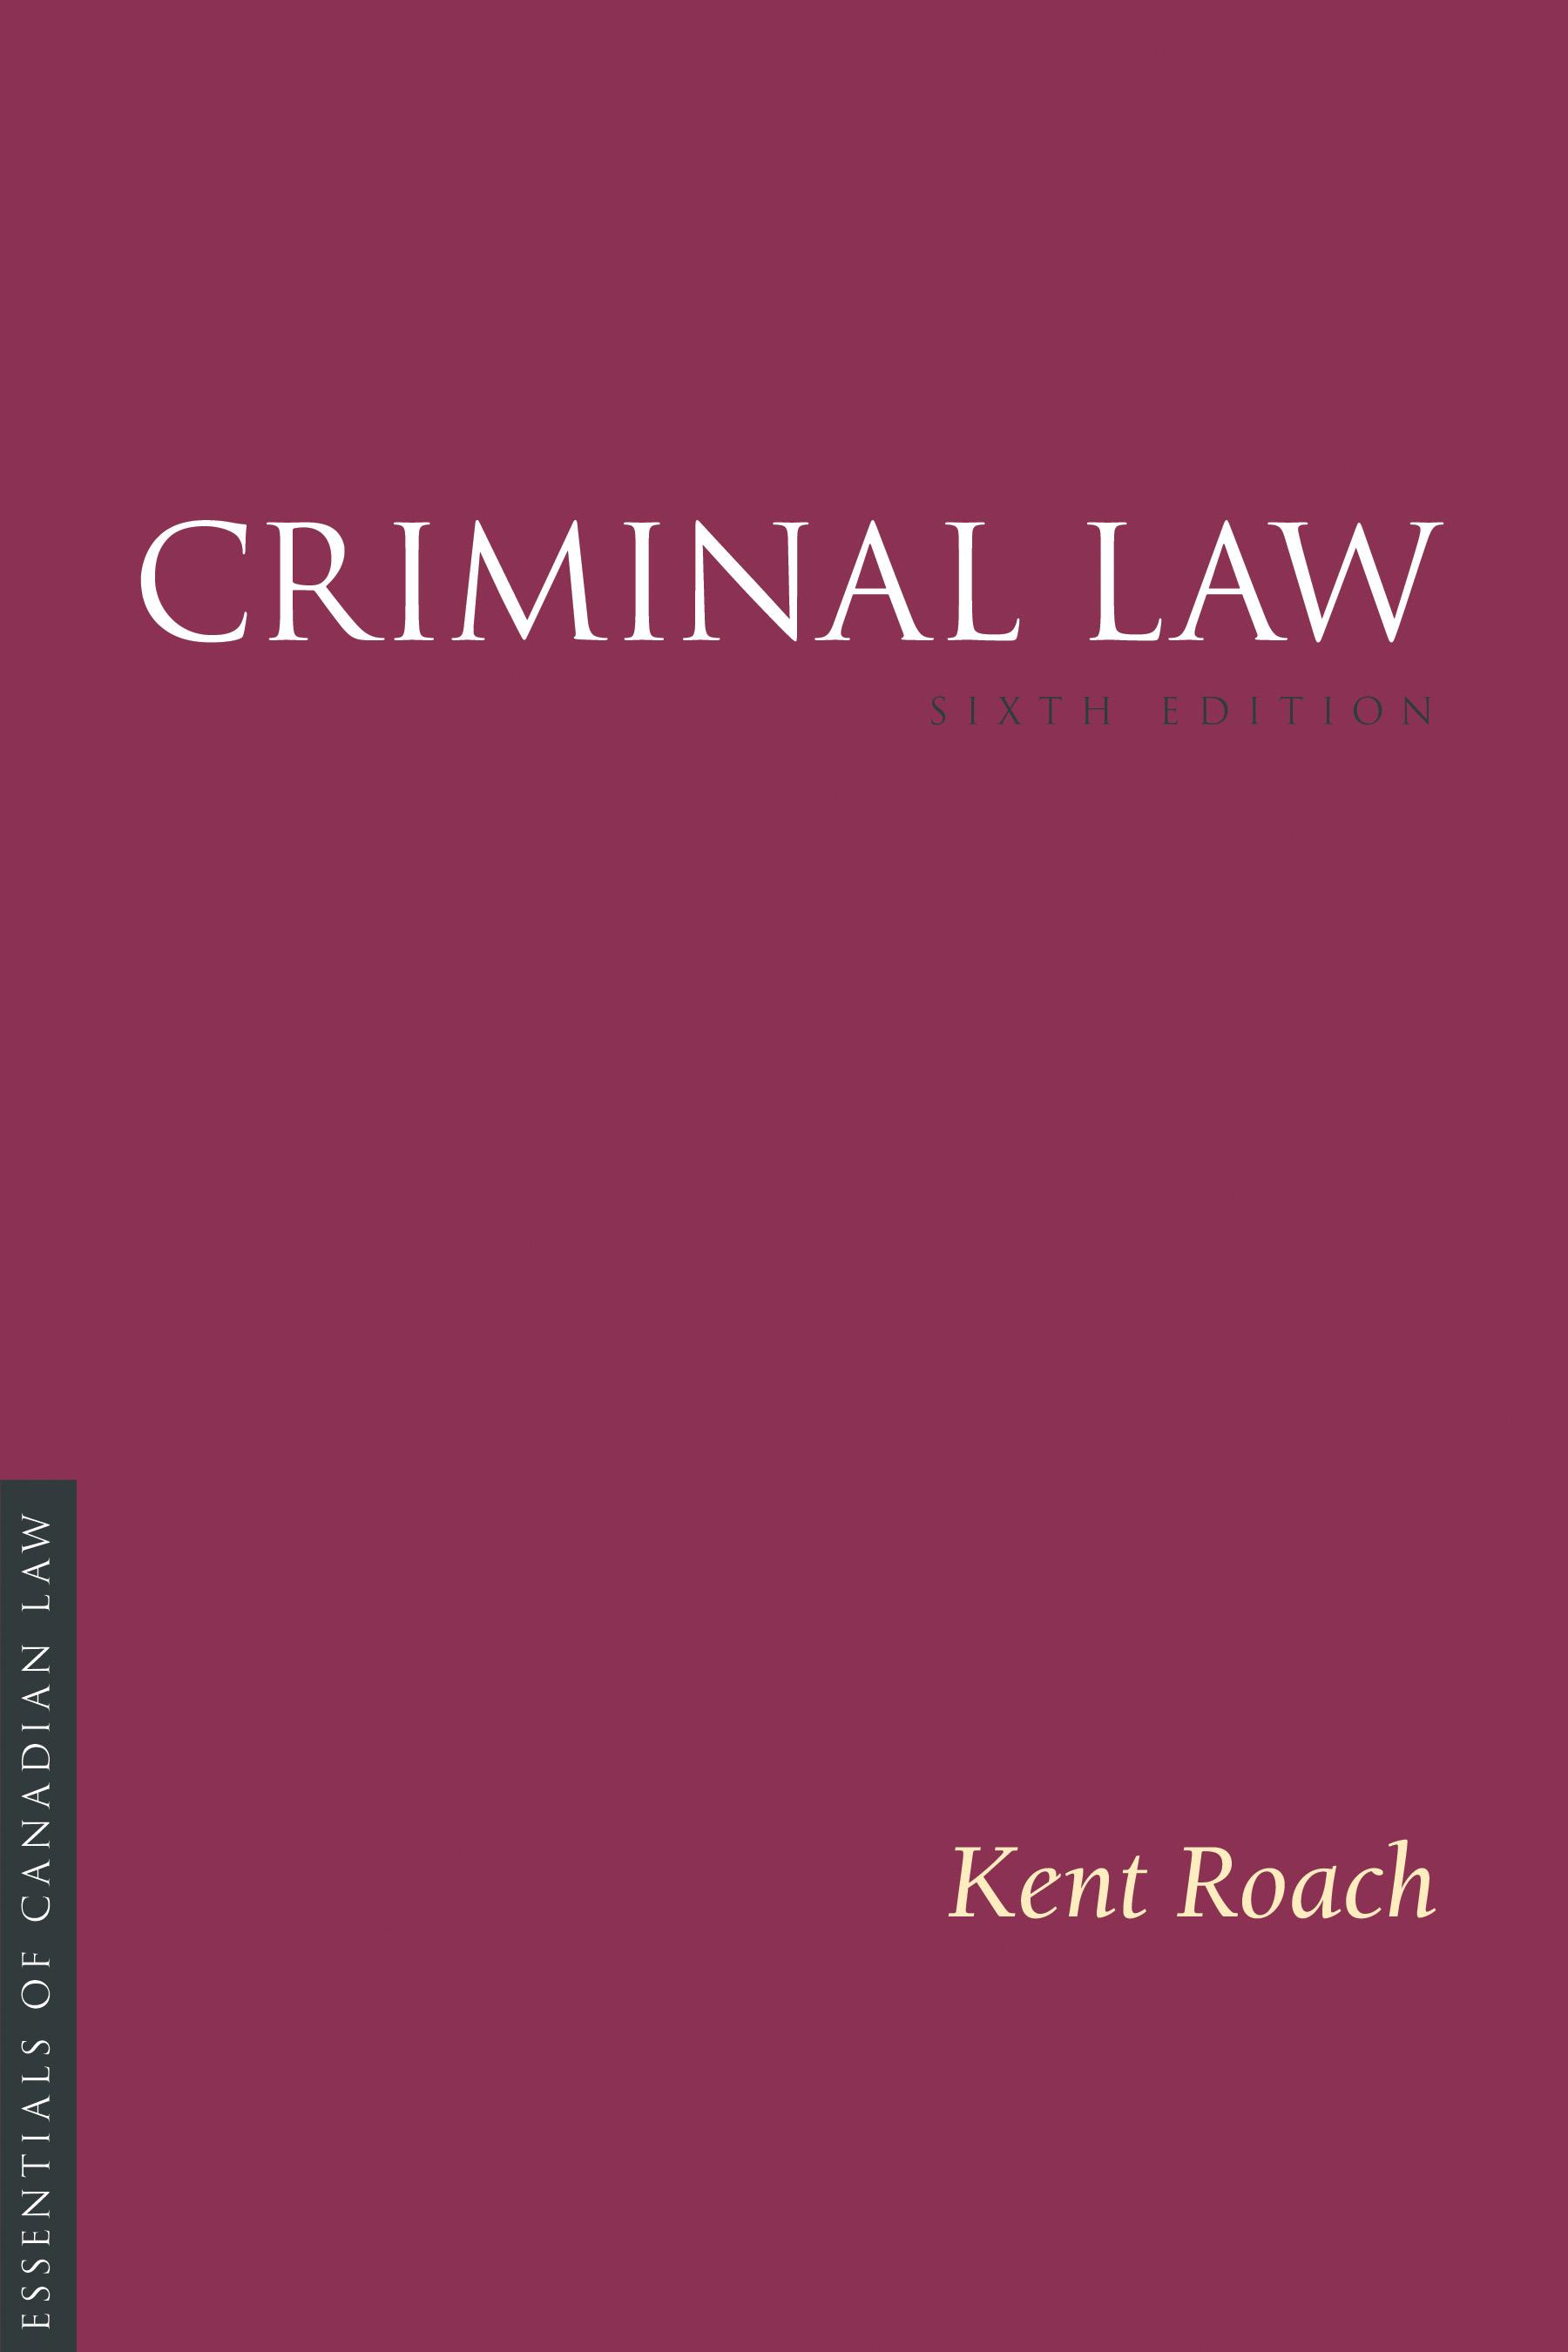 criminal law kent roach 6th edition pdf